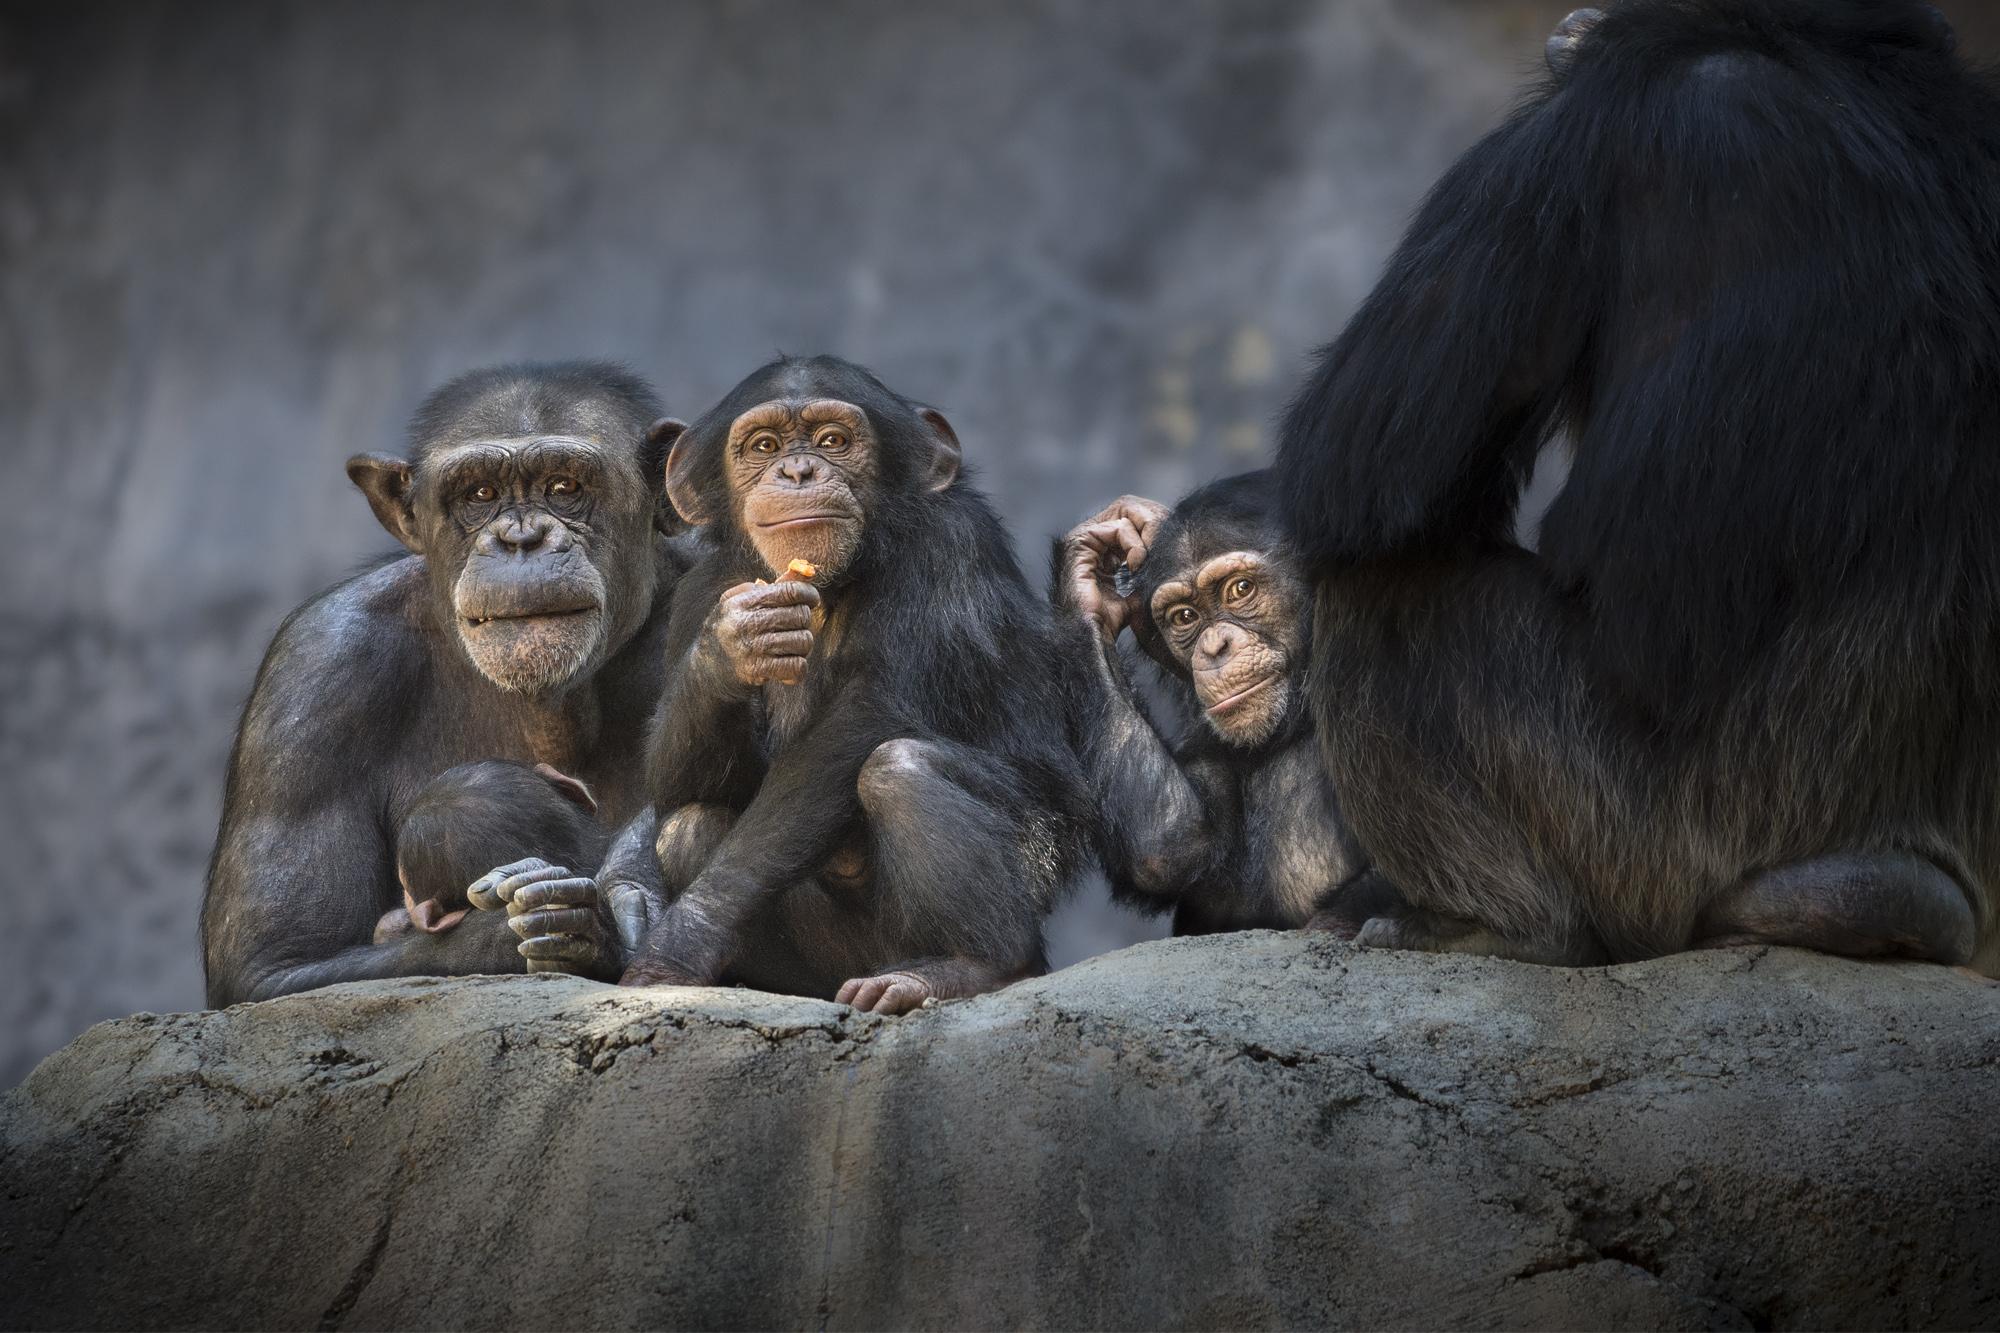 Chimp Group JEP_6992